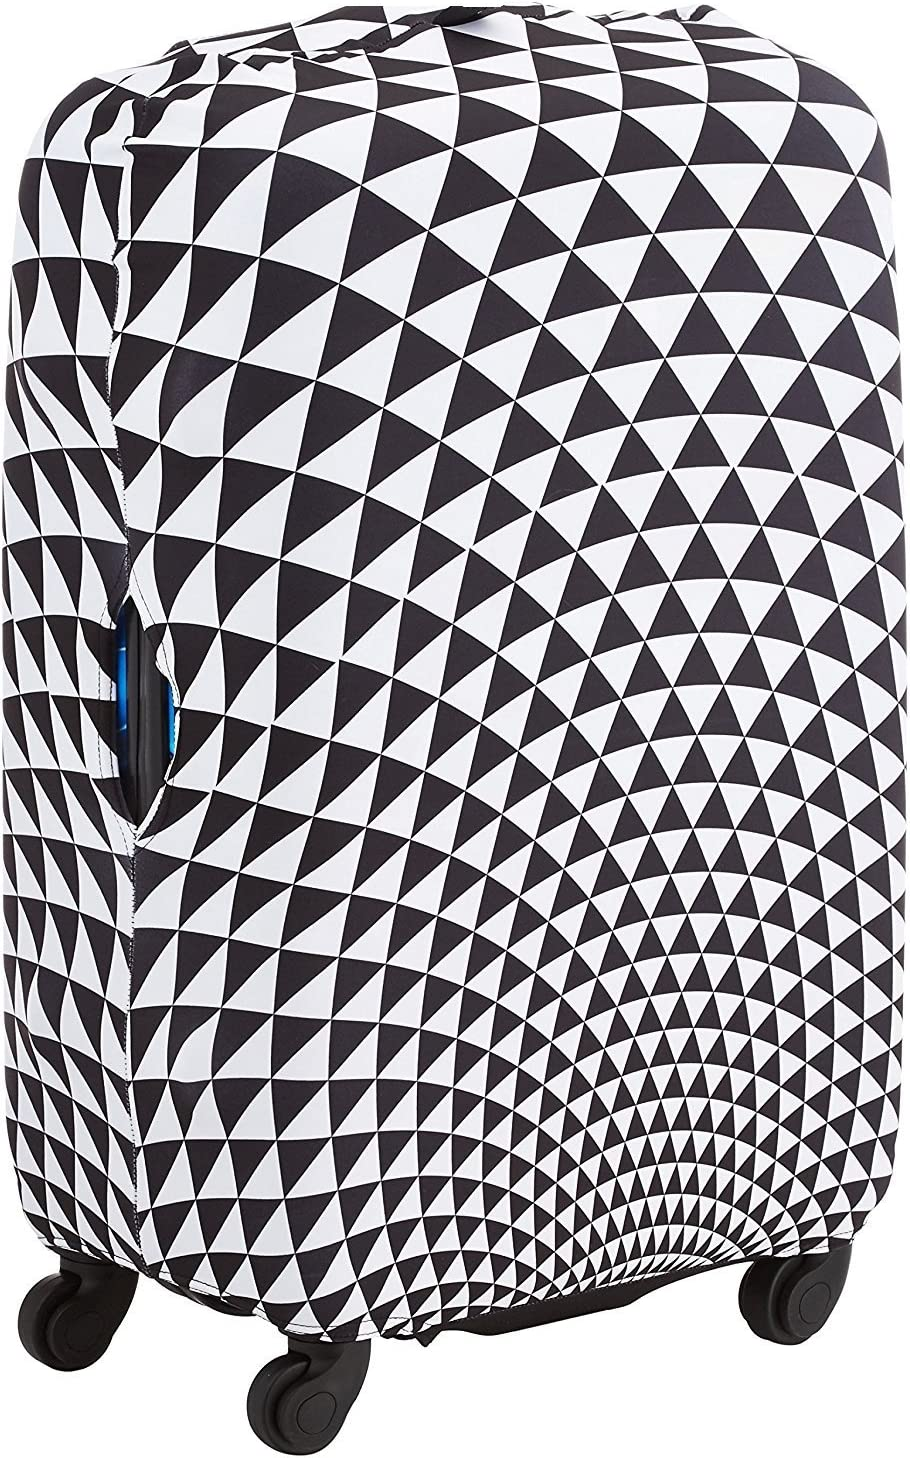 Elastisch Kofferh/ülle Kofferschutzh/ülle Verdickende Blaue Meereswelle Kofferbezug Gep/äck Cover Schutzbezug Luggage Cover Reisekoffer H/ülle f/ür 18-32 Zoll Koffer mit Rei/ßverschluss S 18-21